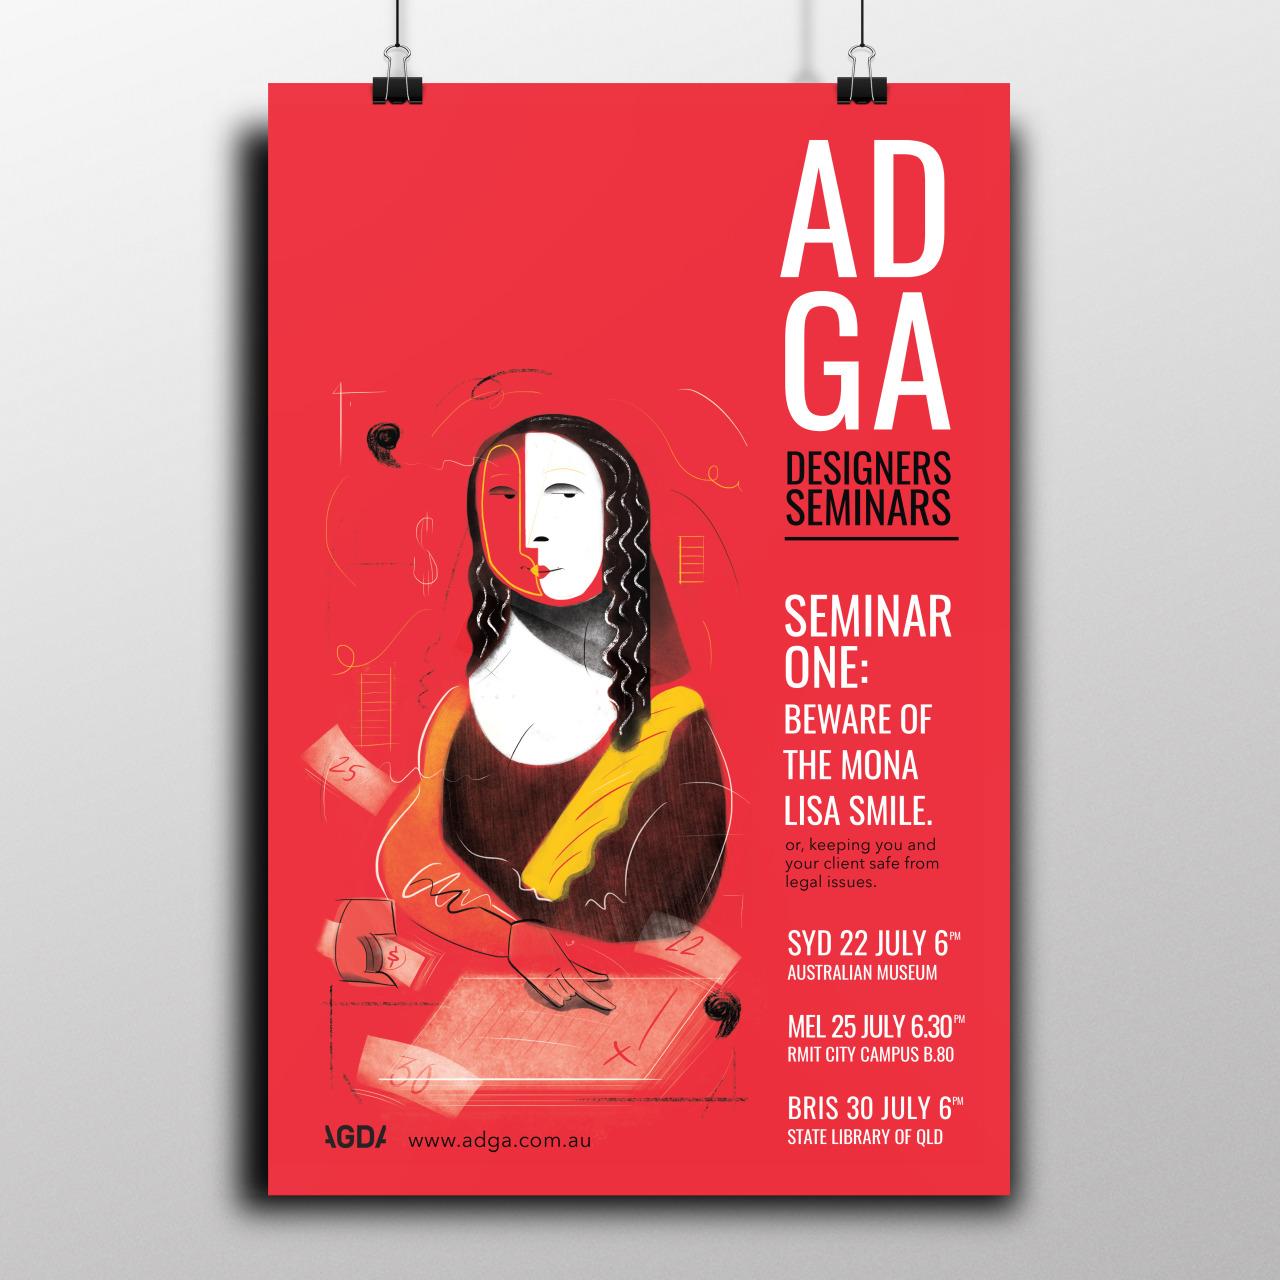 kimberly_summer_design_adga-1.jpg